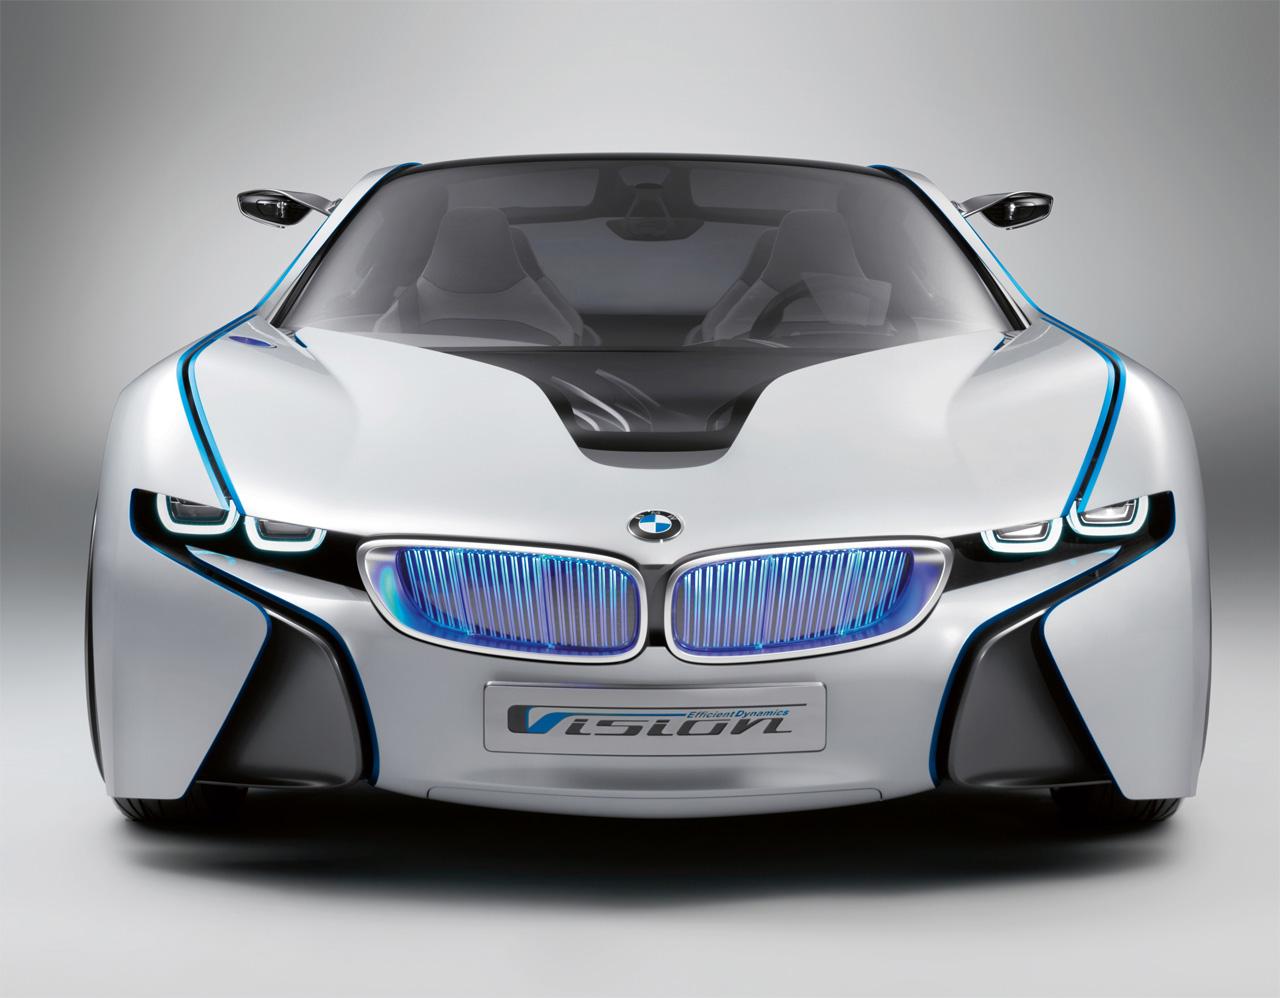 http://1.bp.blogspot.com/-5IRuTIz0kz8/UCSUveOc_bI/AAAAAAAAA_4/TwaKQctSomQ/s1600/bmw-vision-efficientdynamics-hybrid-concept-car.jpg